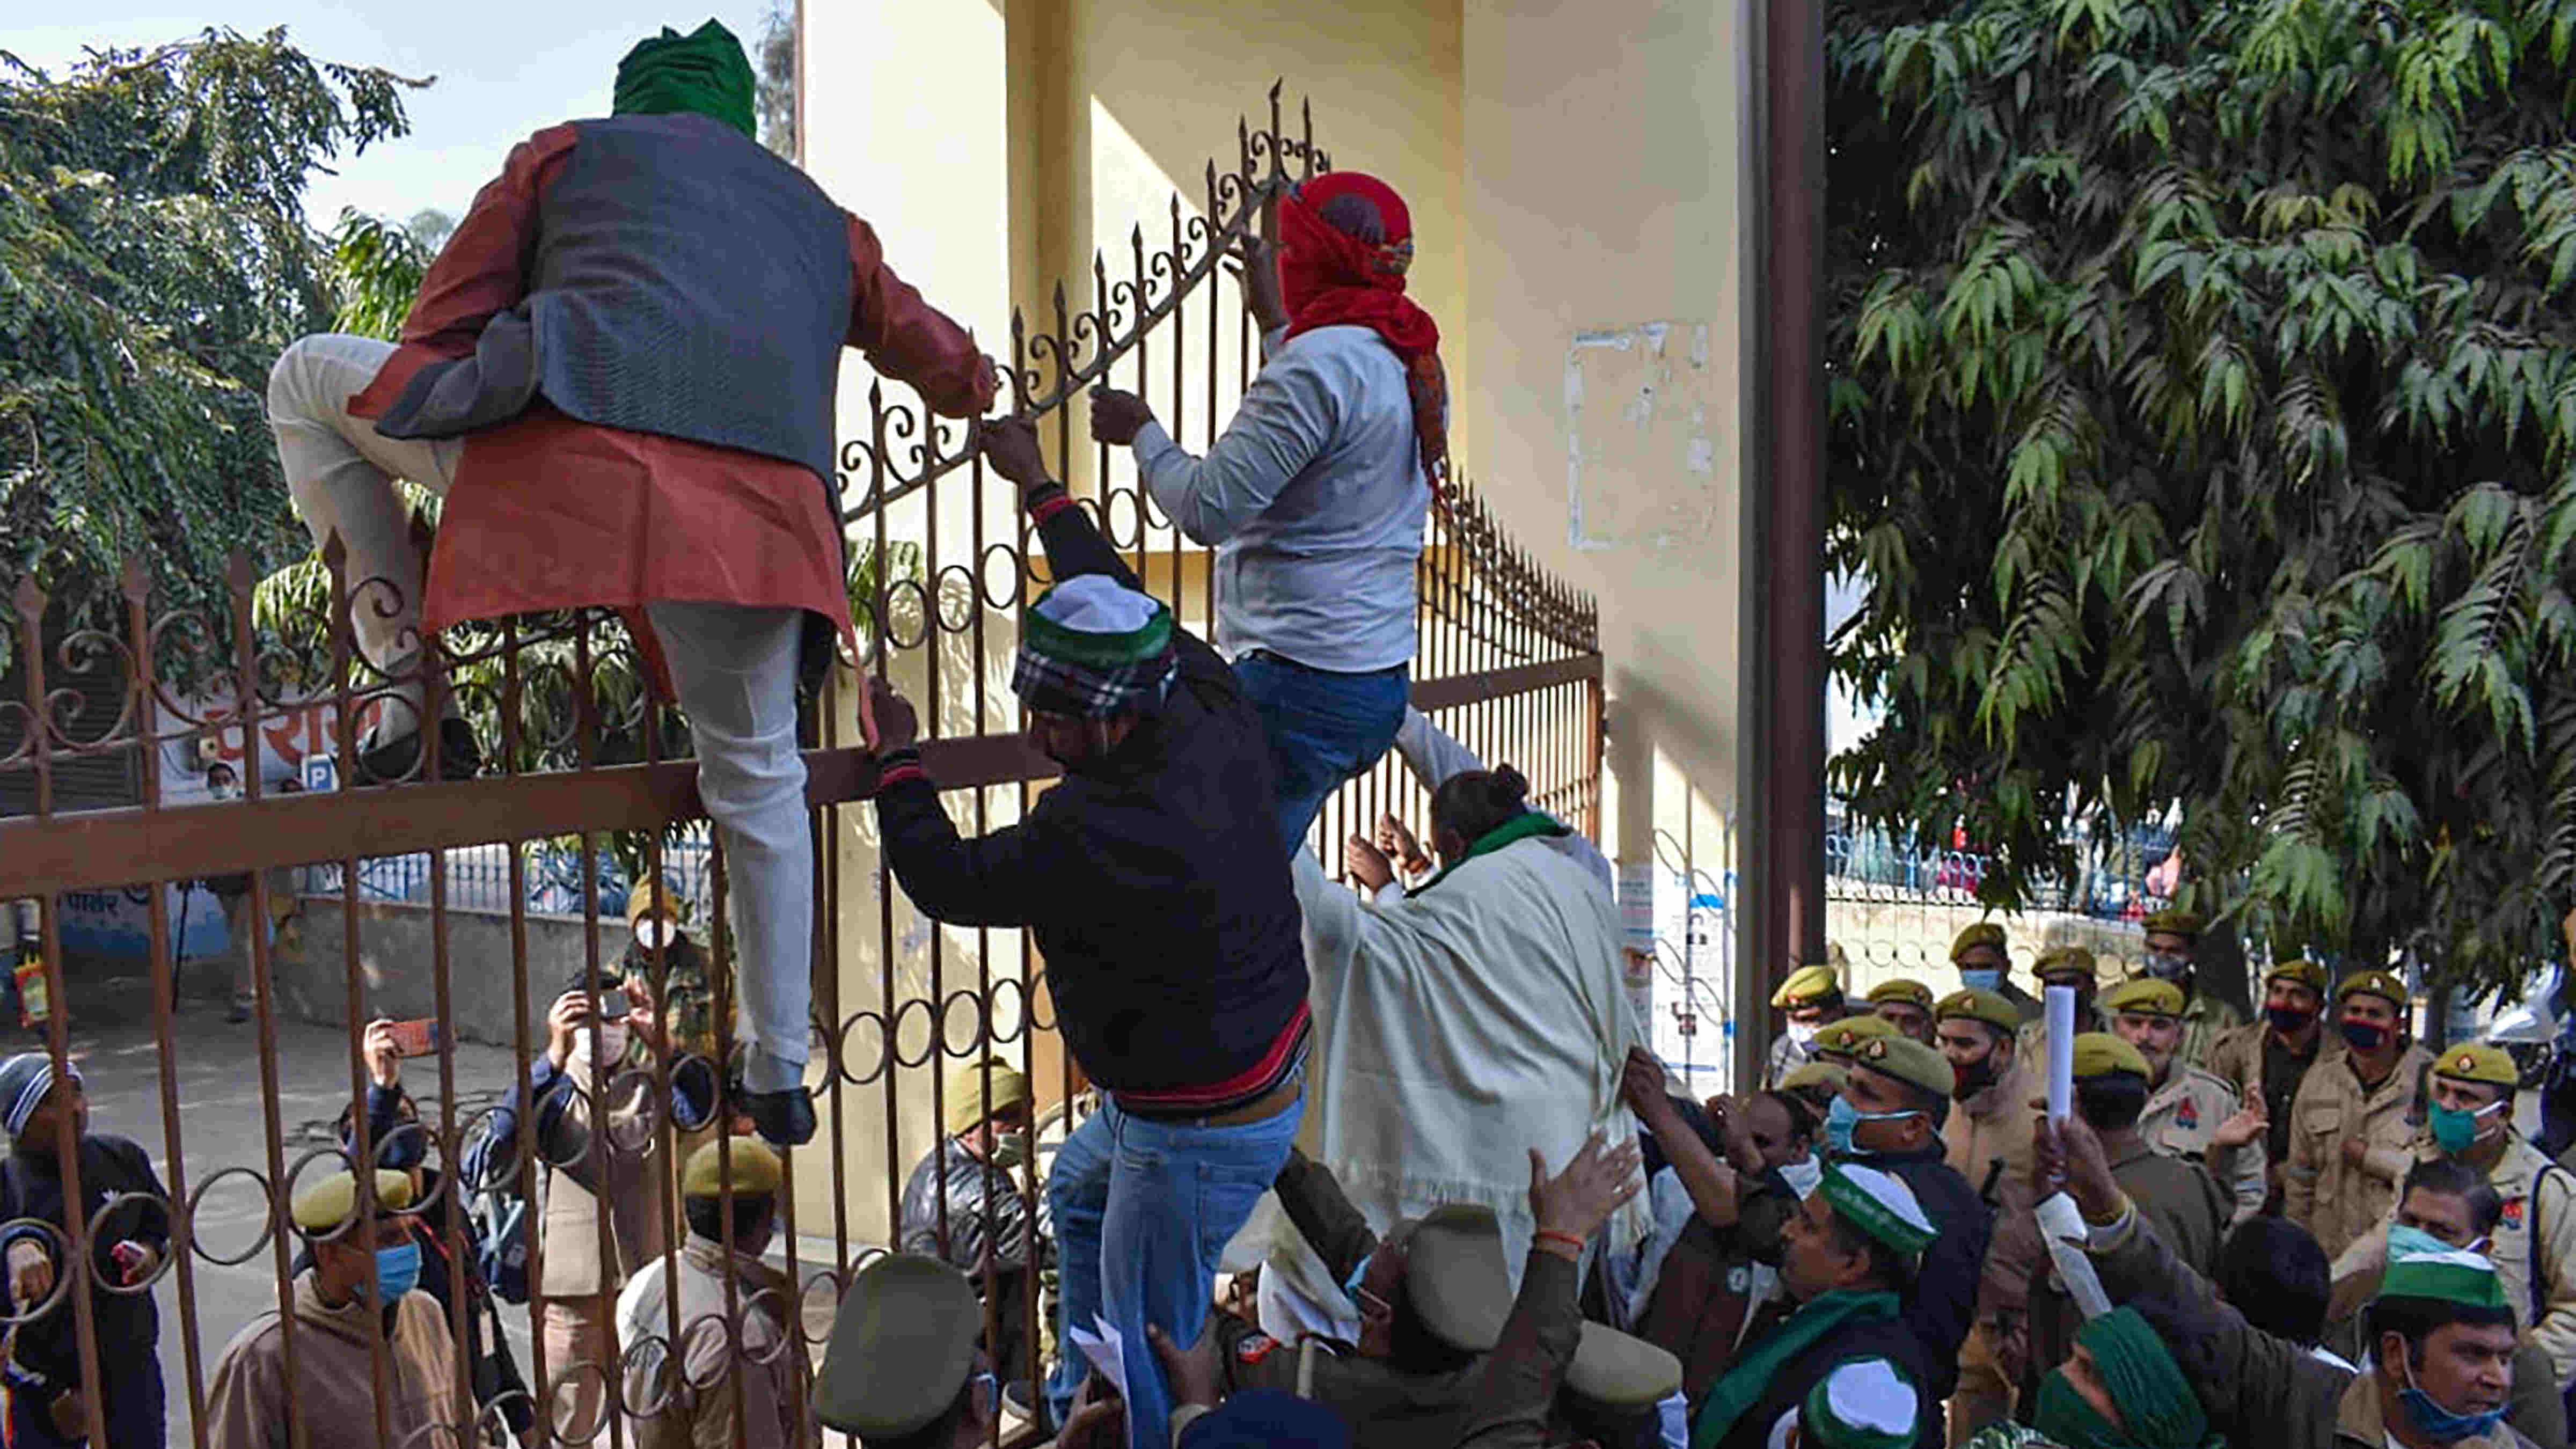 Bharatiya Kisan Union (BKU) workers climb on a gate during their protest, in Bulandshahr, Monday, Dec. 14, 2020.